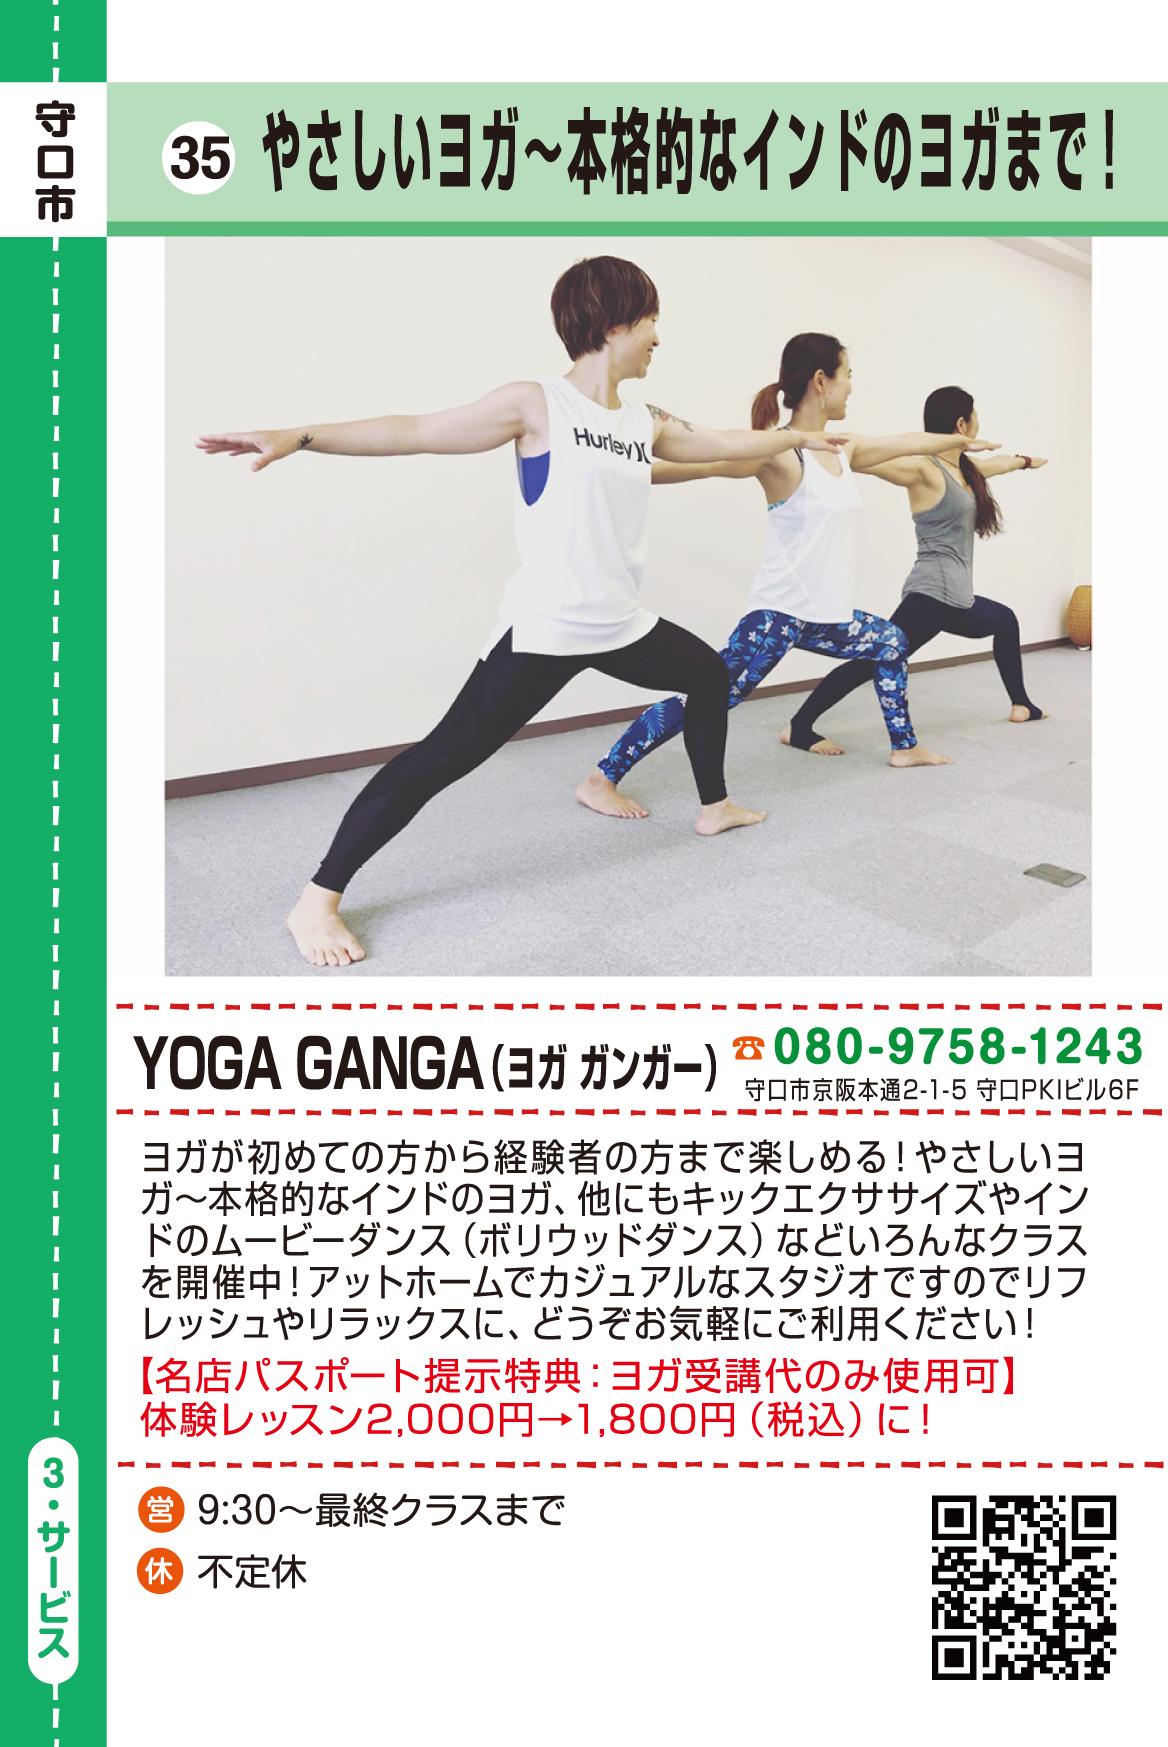 YOGA GANGA(ヨガ ガンガー)